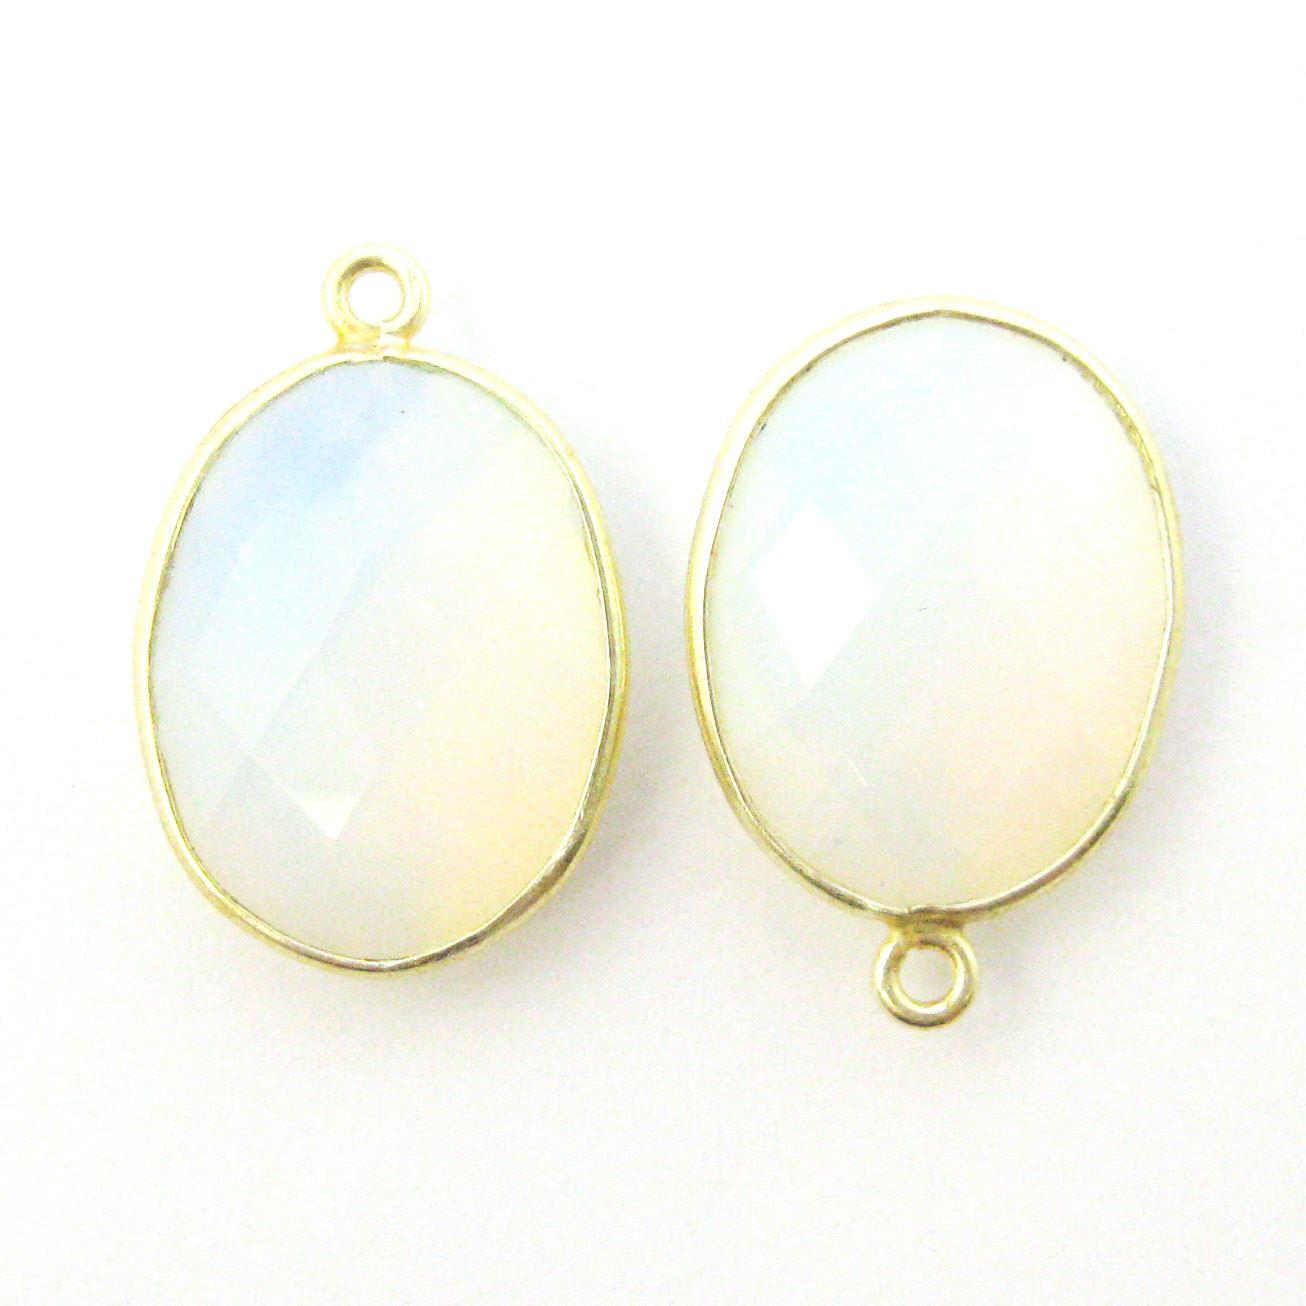 Bezel Gemstone Pendant - 14x18mm Faceted Oval - Opalite Quartz (Sold per 2 pieces)